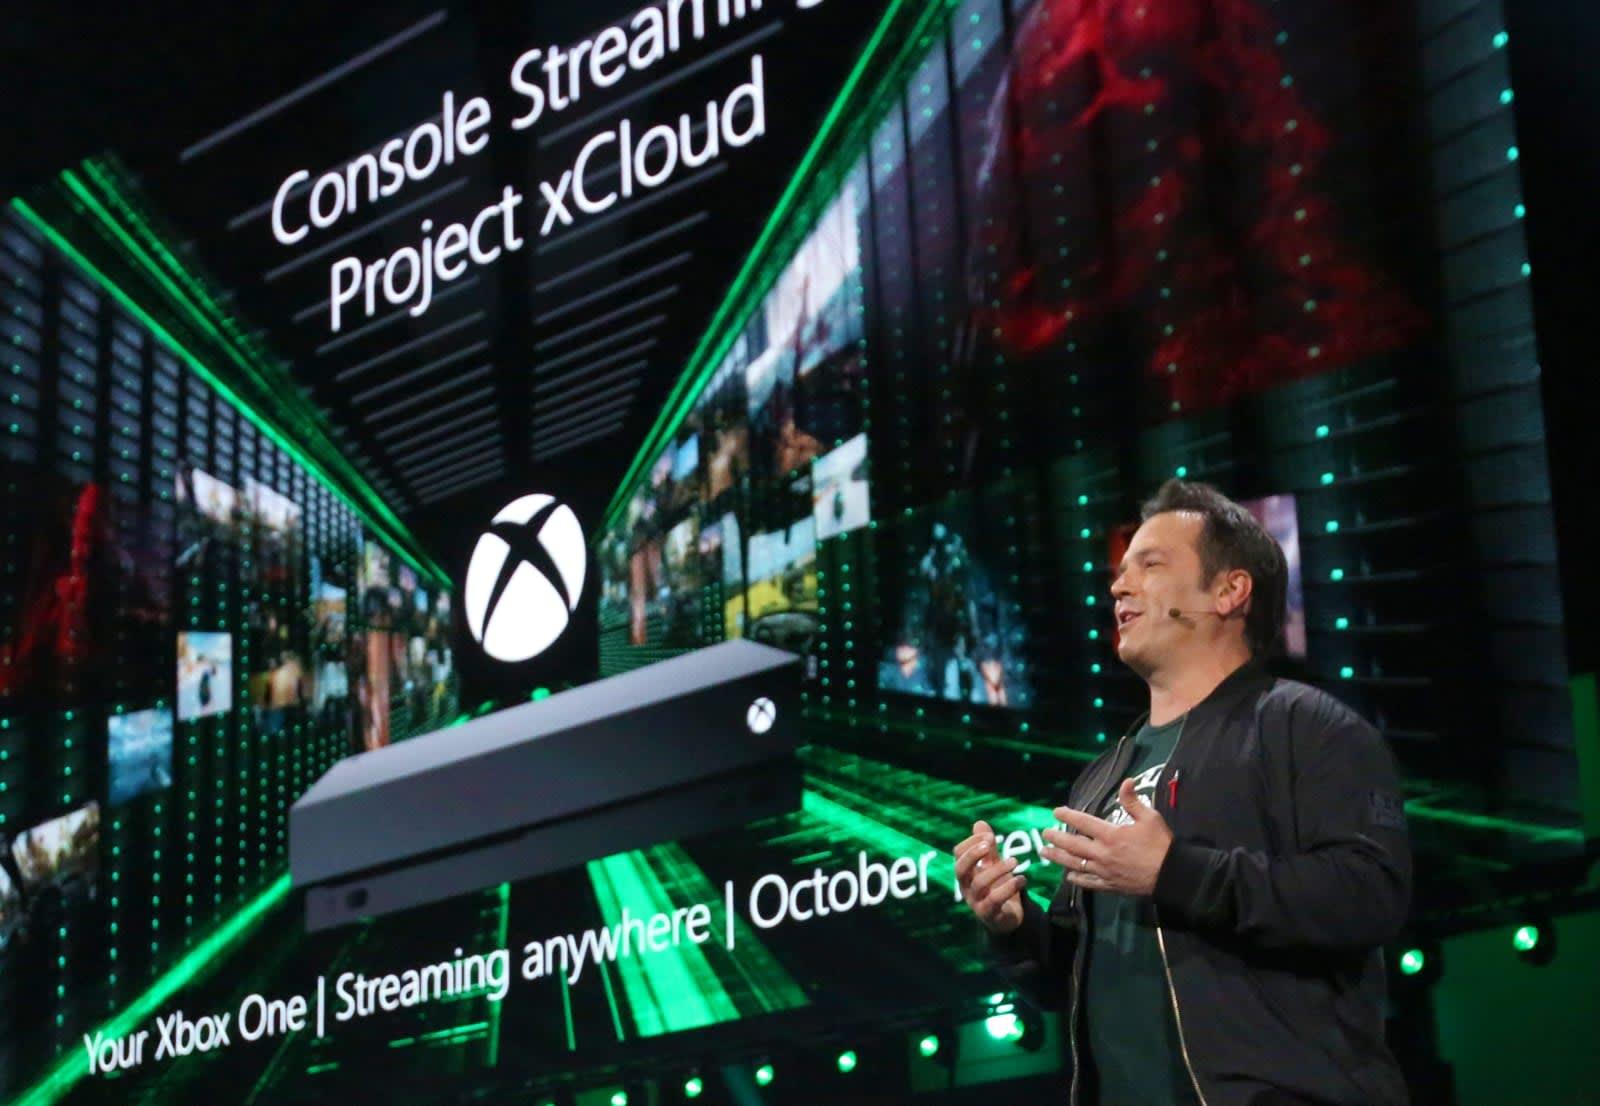 Microsoft's xCloud game streaming begins in October (updated)